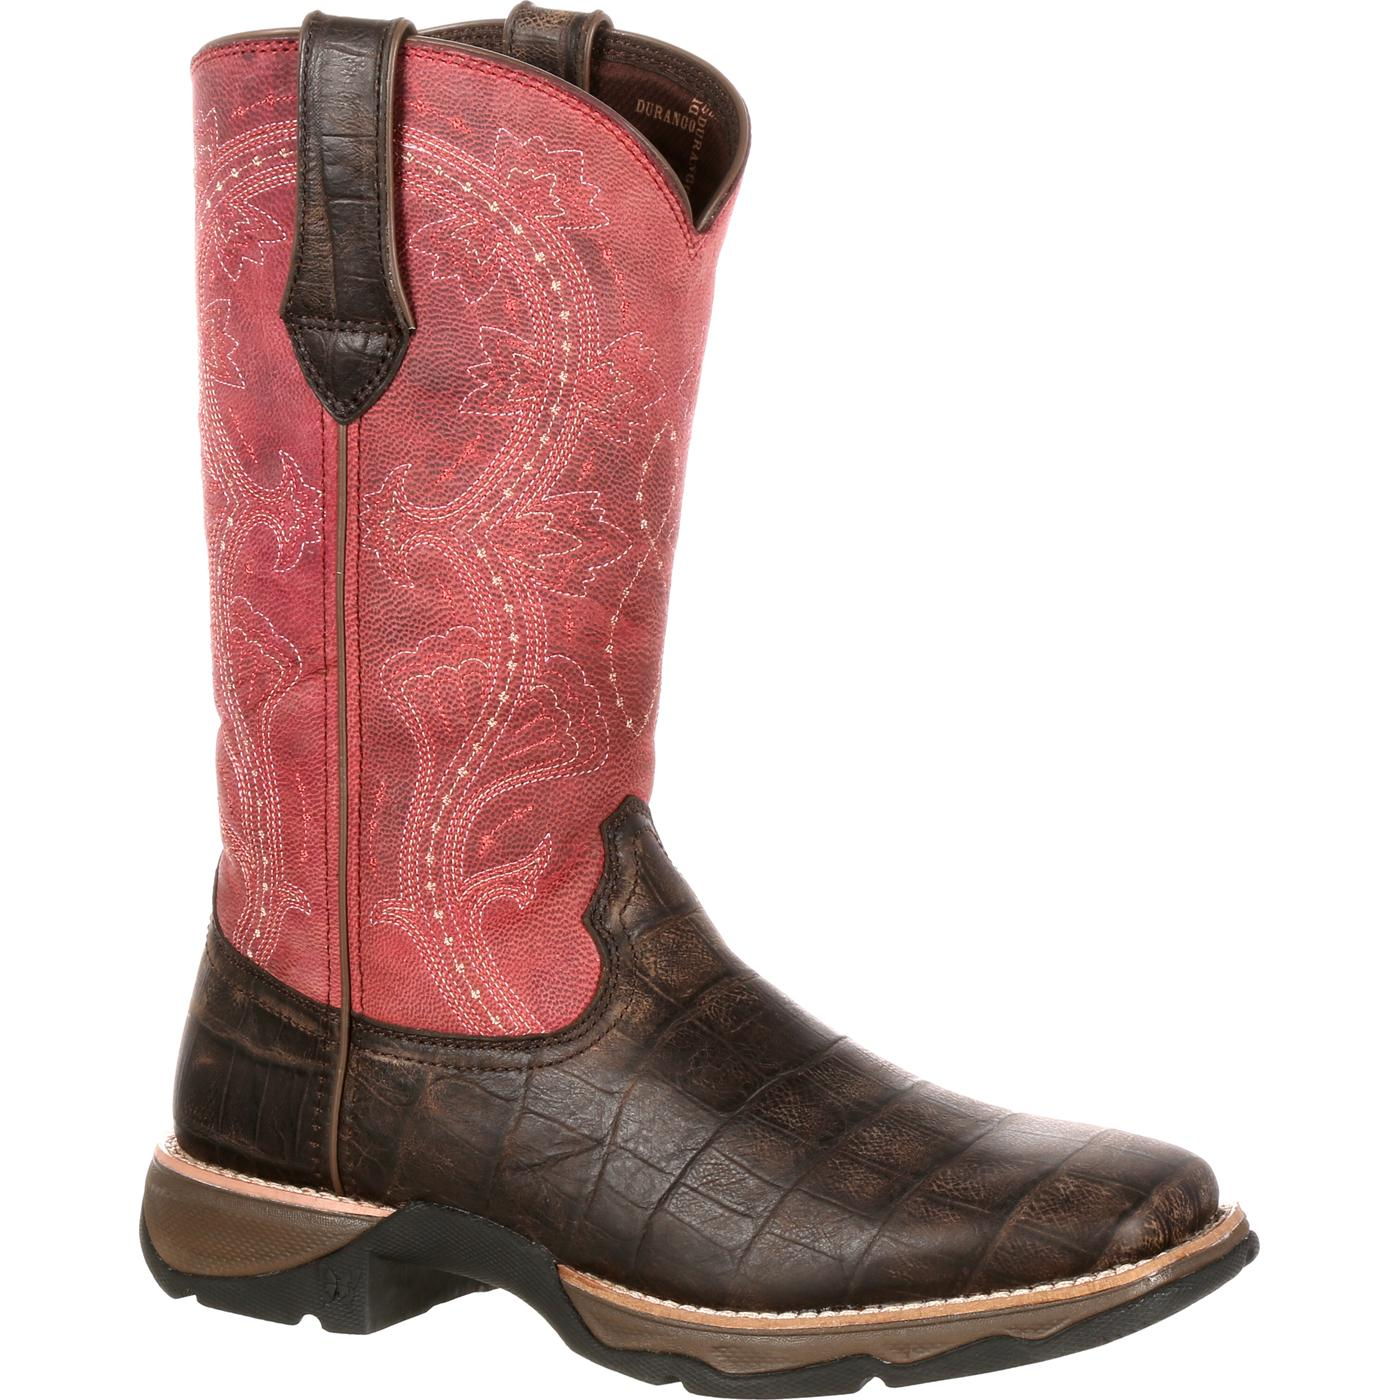 838ca33221d Lady Rebel by Durango Women's Gator Embossed Western Boot